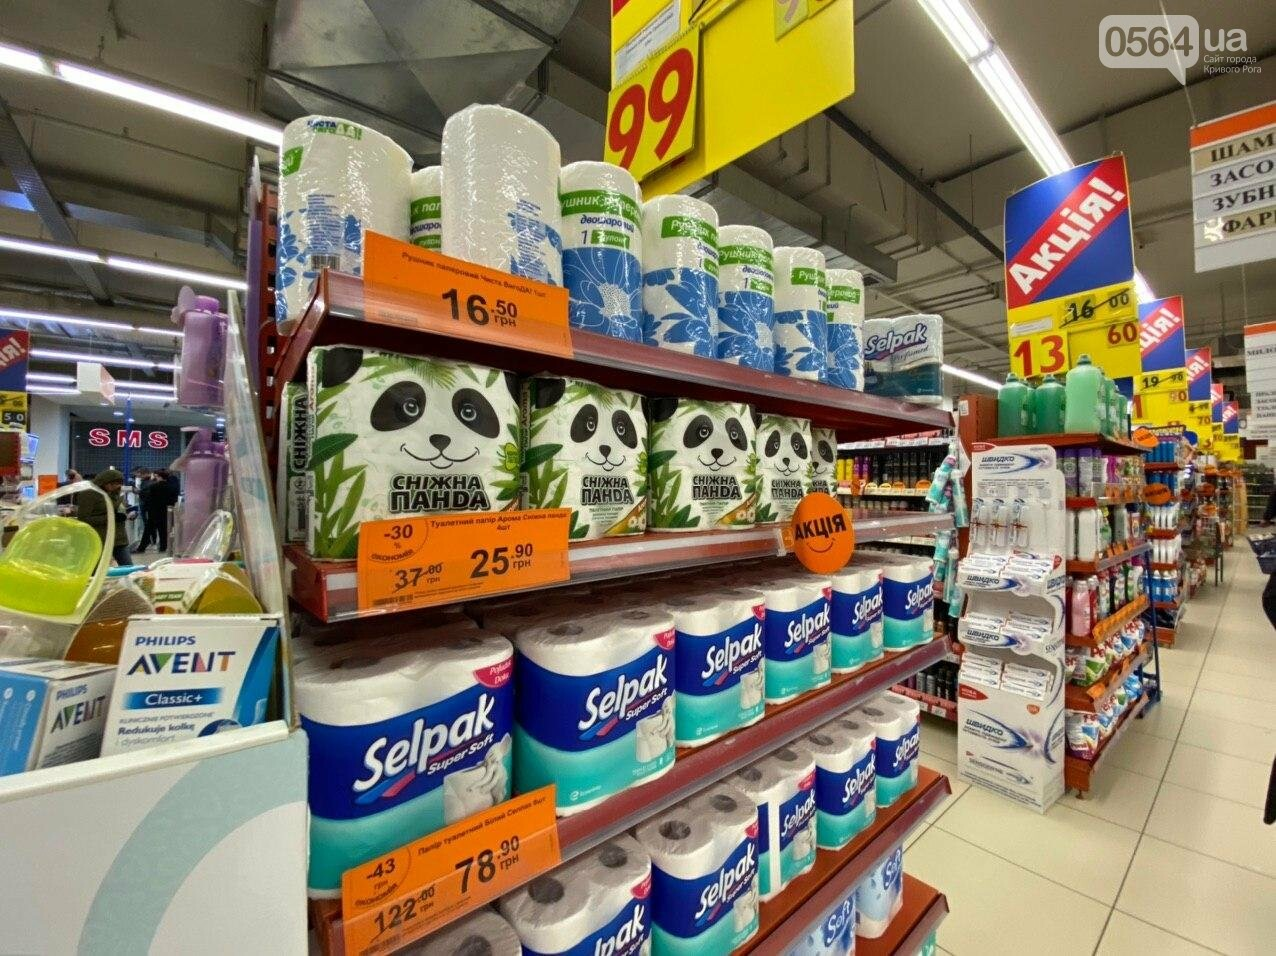 Туалетная бумага и гречка: что скупают криворожане во время карантина, - ФОТО , фото-18